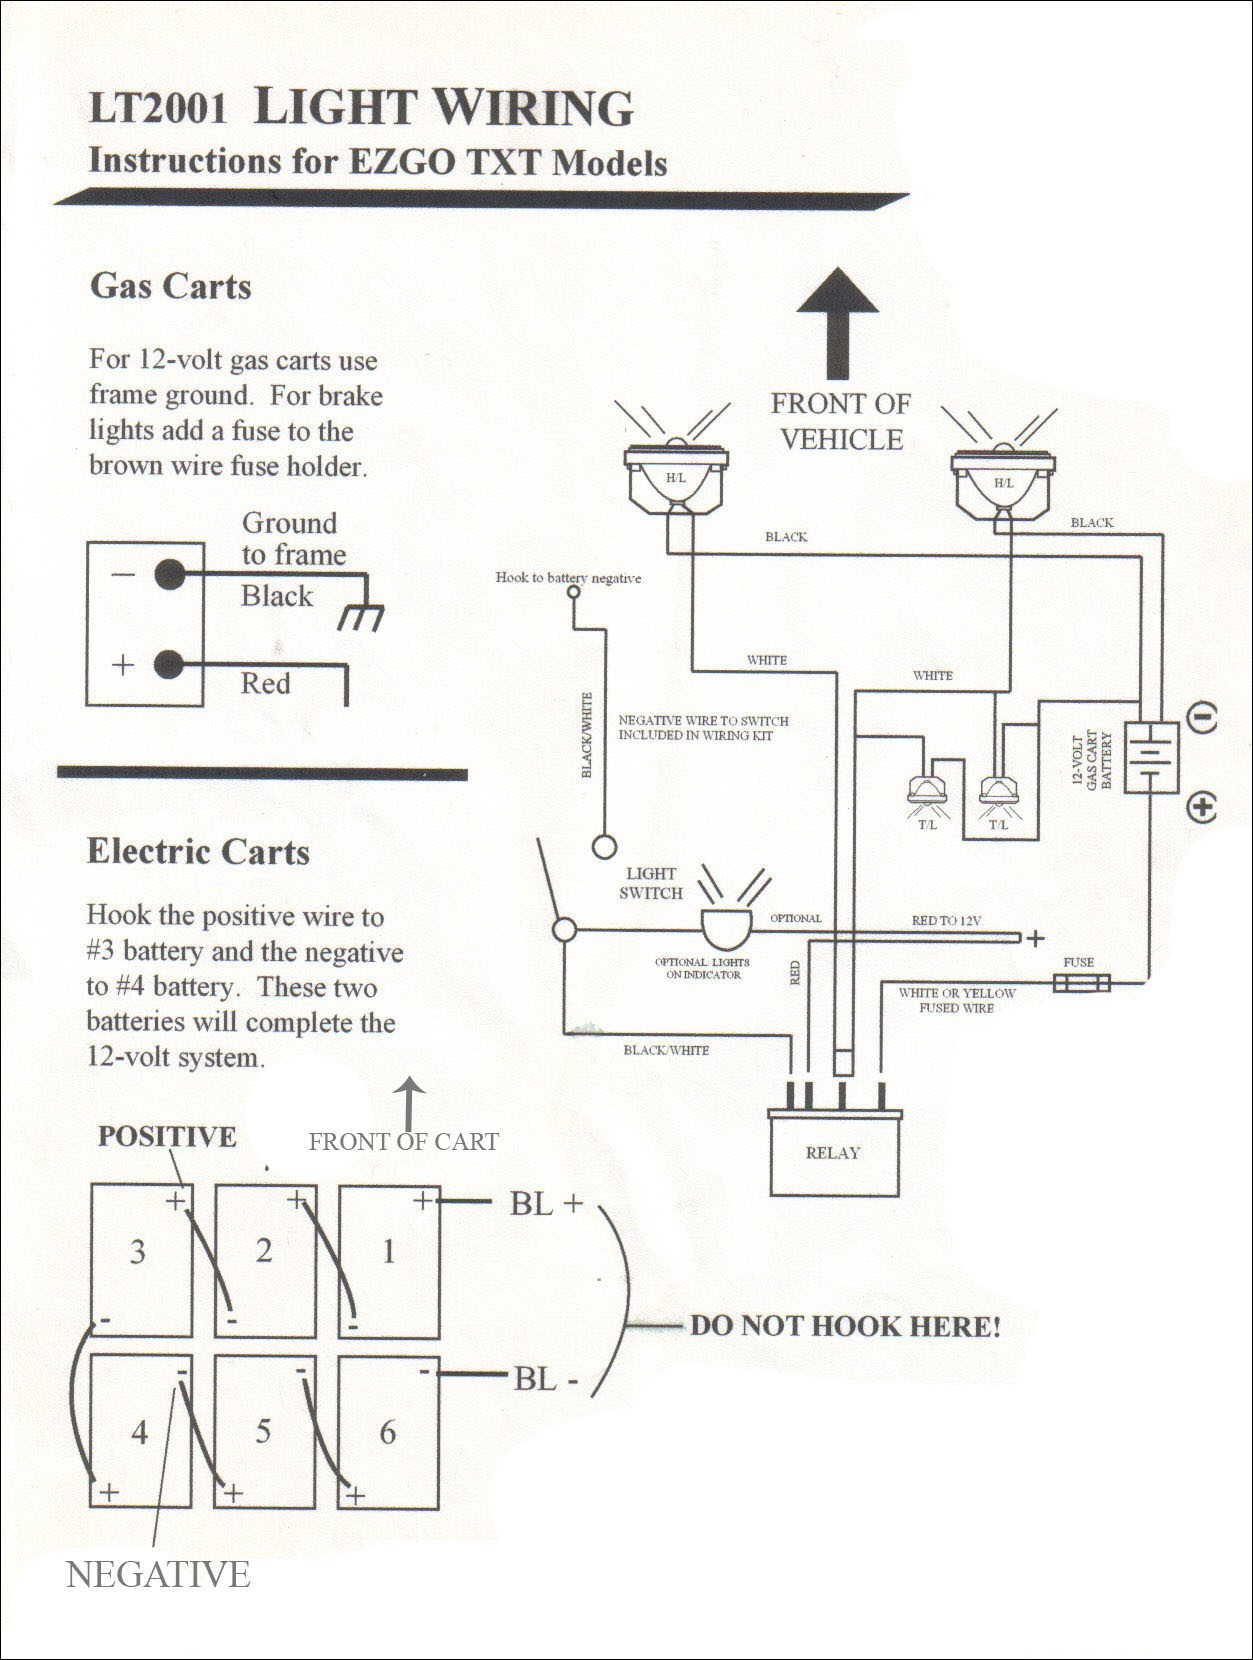 golight wiring diagram elegant ezgo wiring diagram gas golf cart mastertopforum of golight wiring diagram